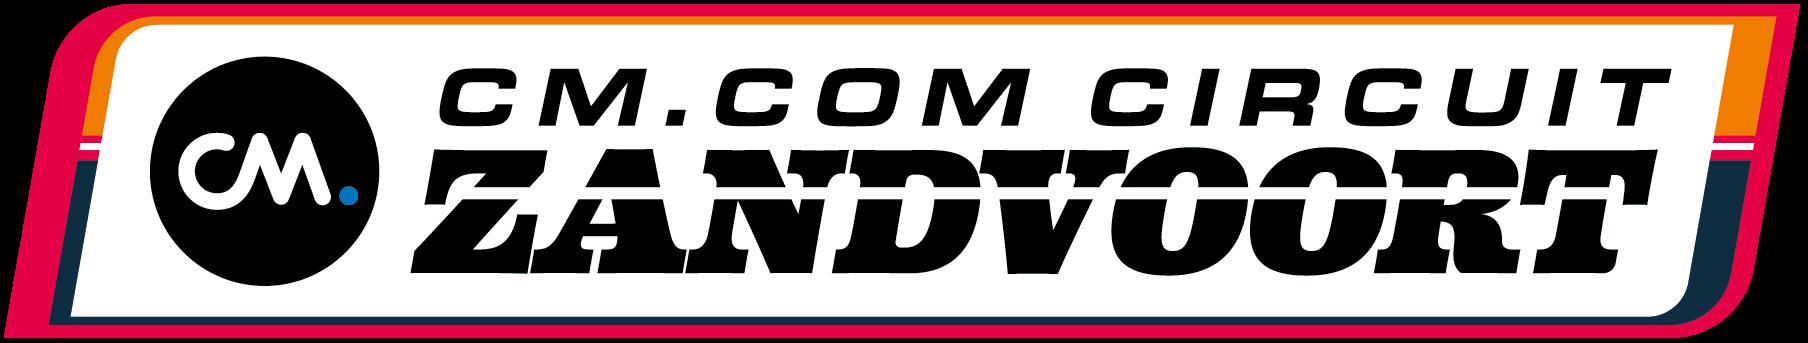 Logo CM.com Circuit Zandvoort